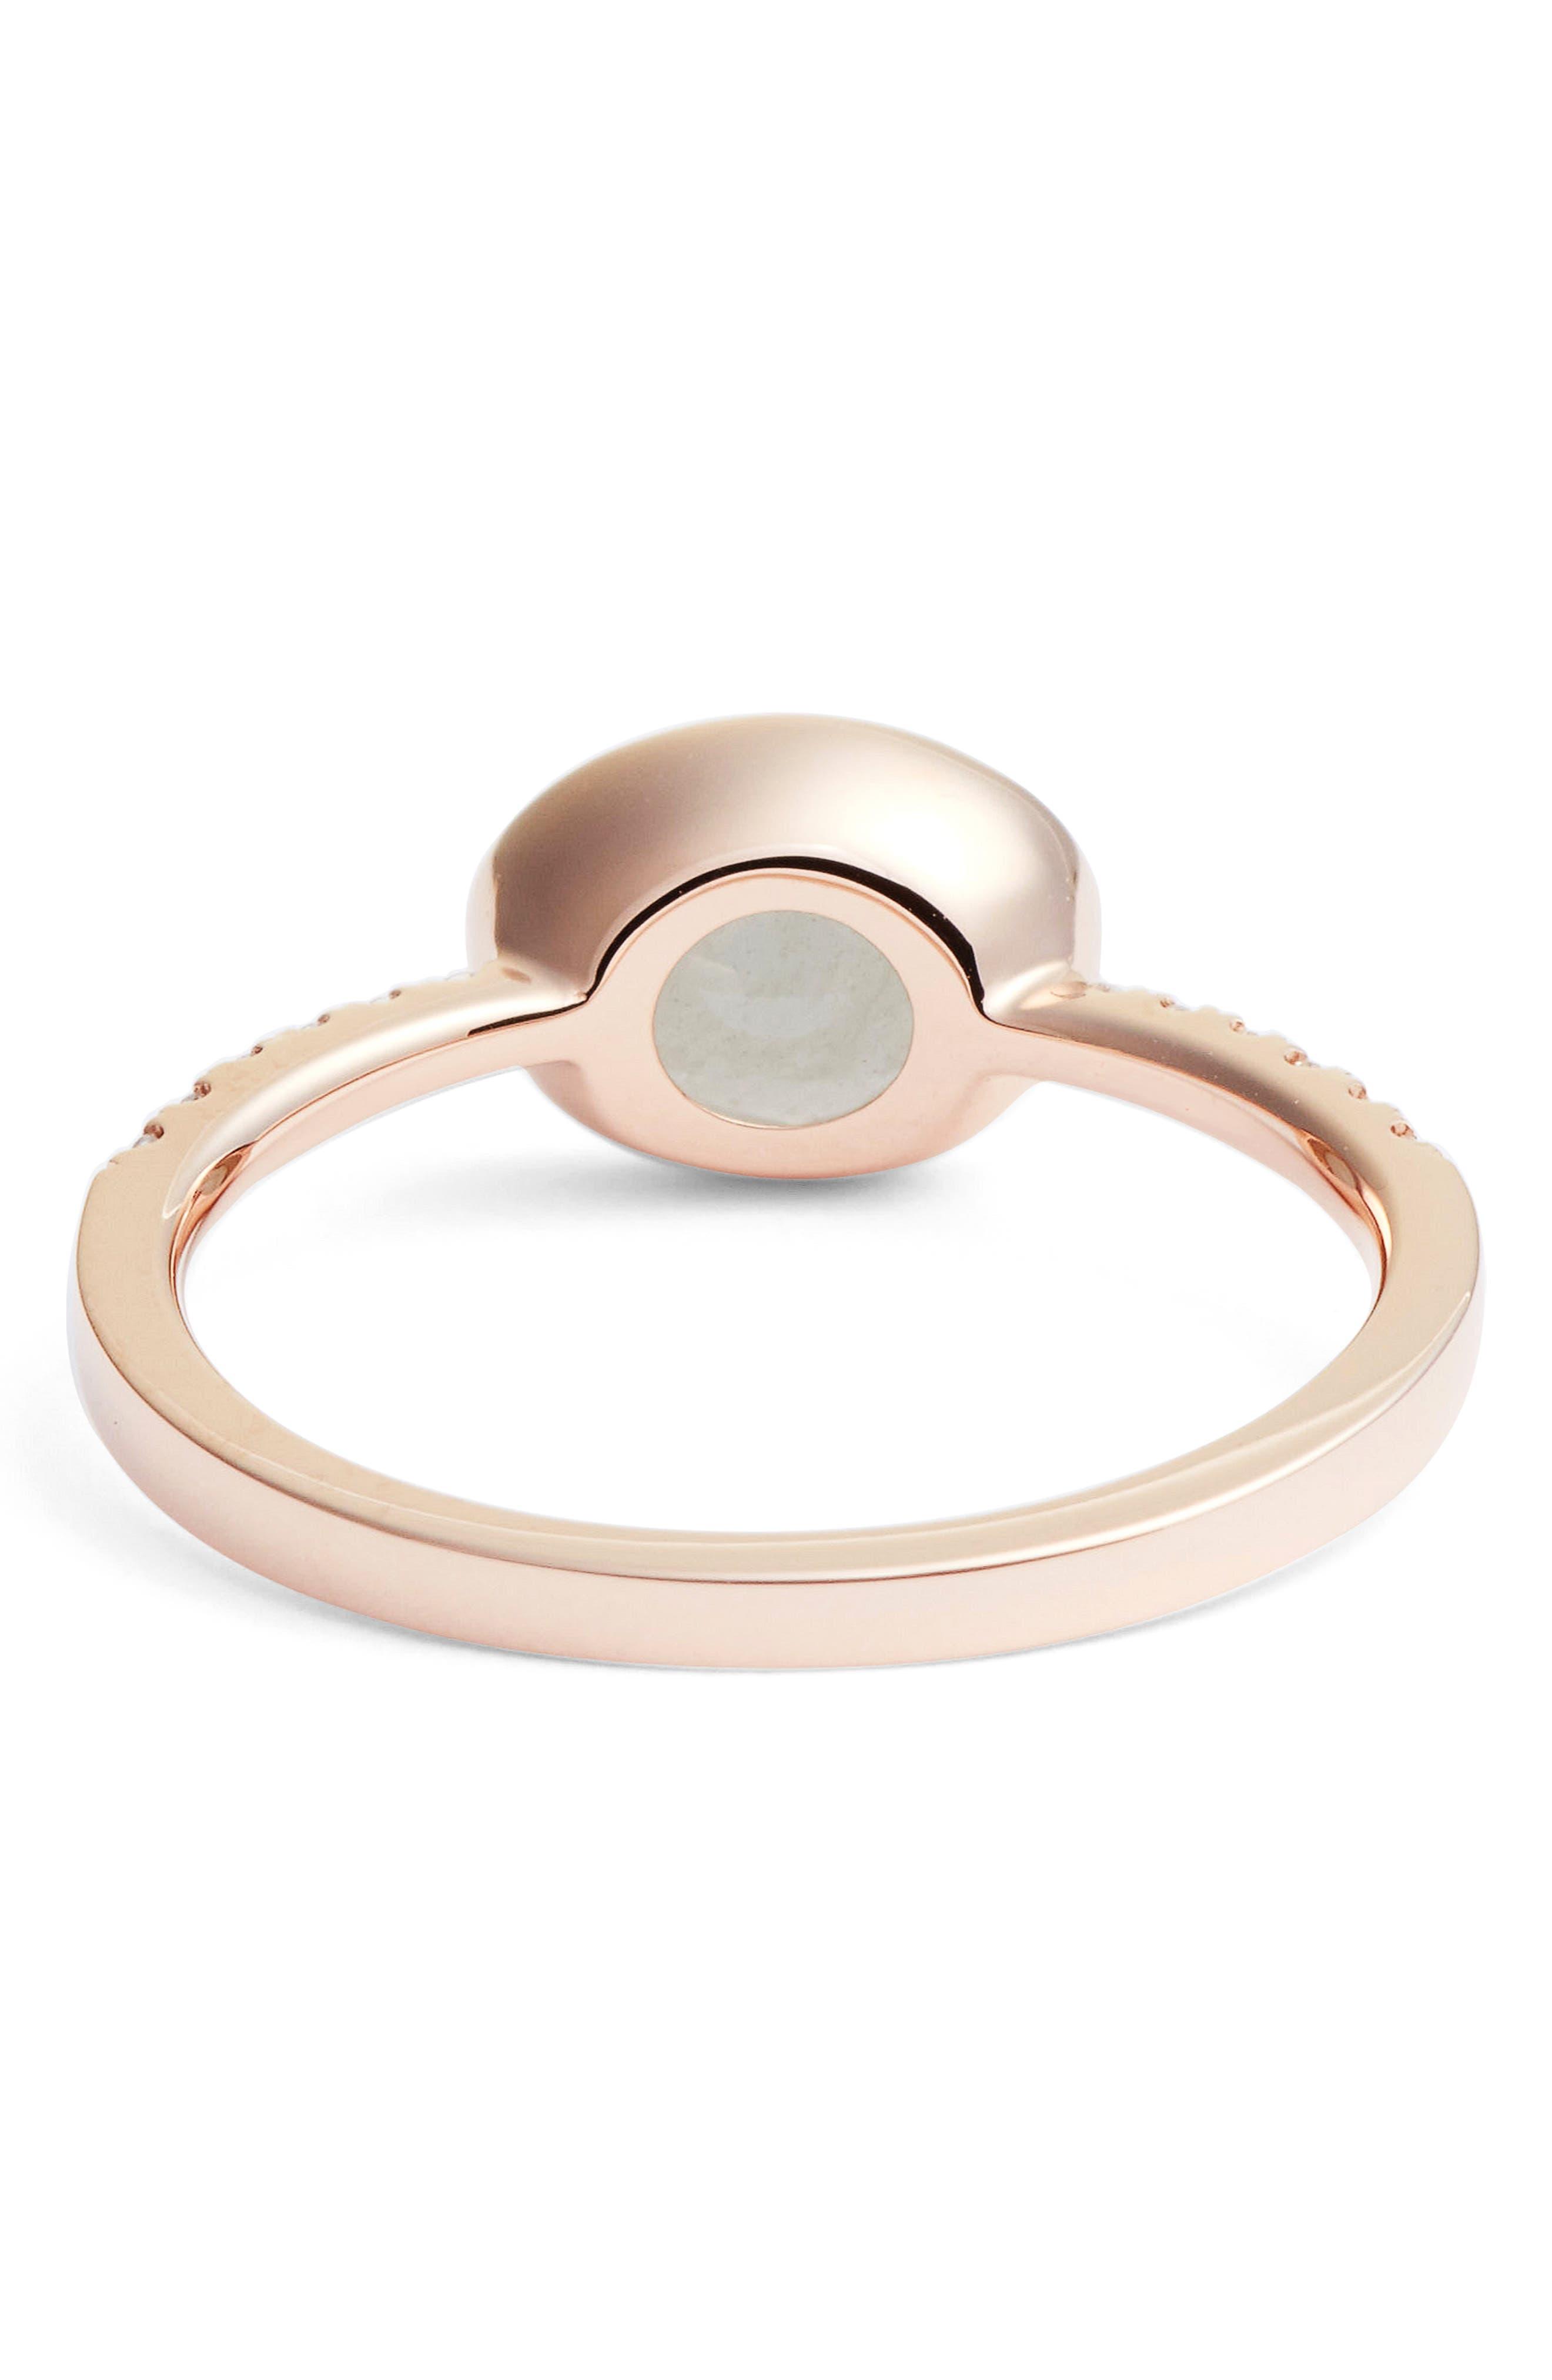 Iris Semiprecious Stone & Diamond Ring,                             Alternate thumbnail 3, color,                             Rose Gold/ Milky Aqua